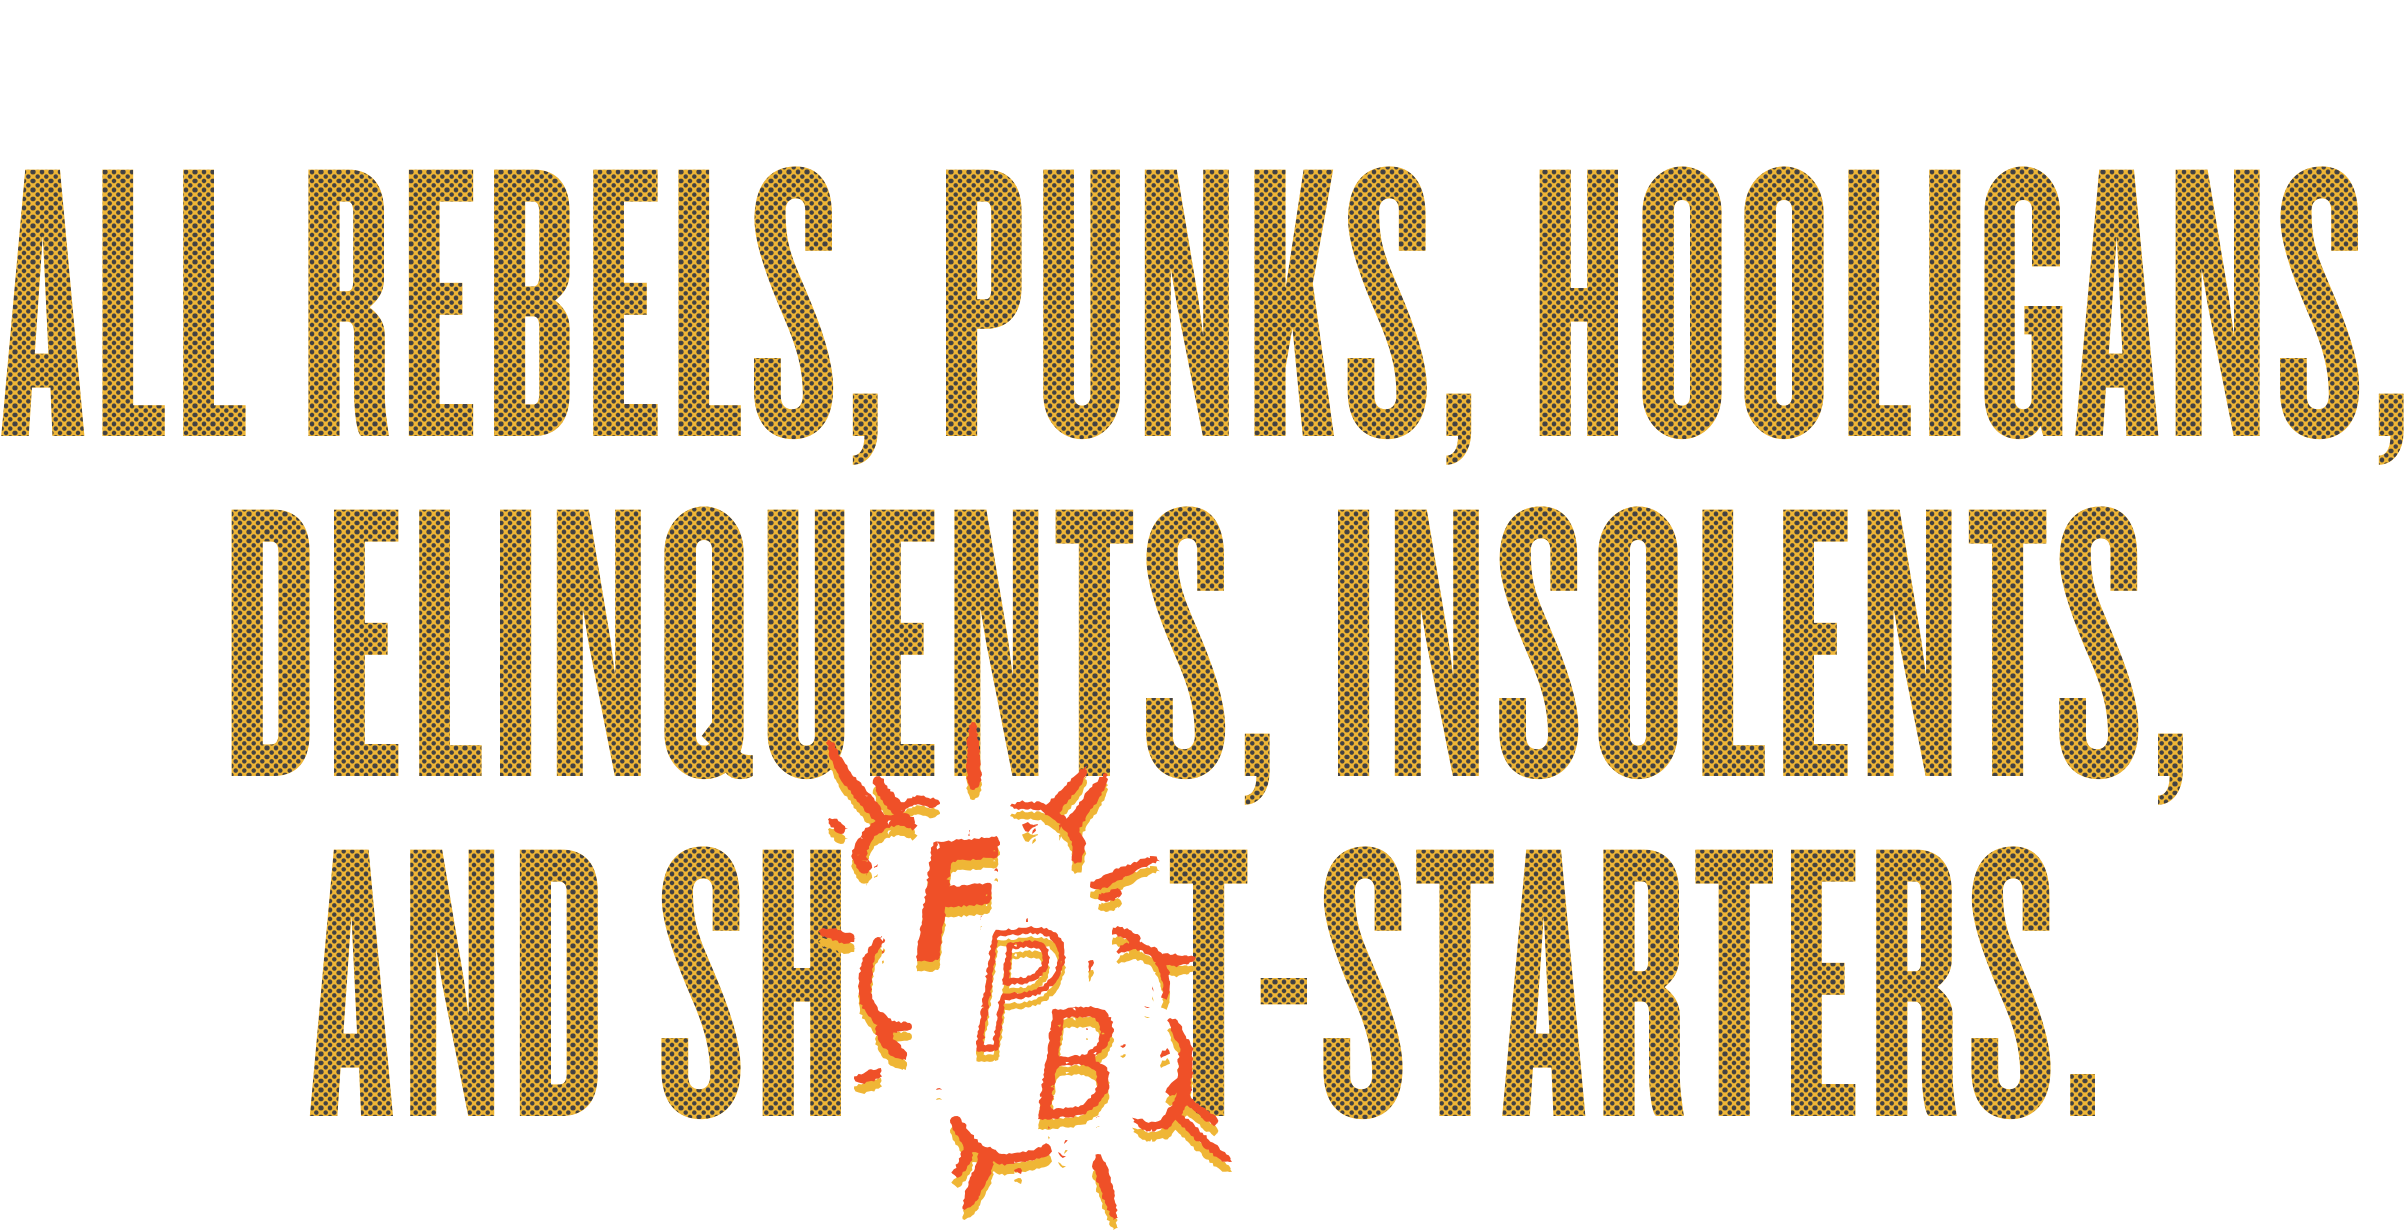 RebelsAndShitstarters_3.png